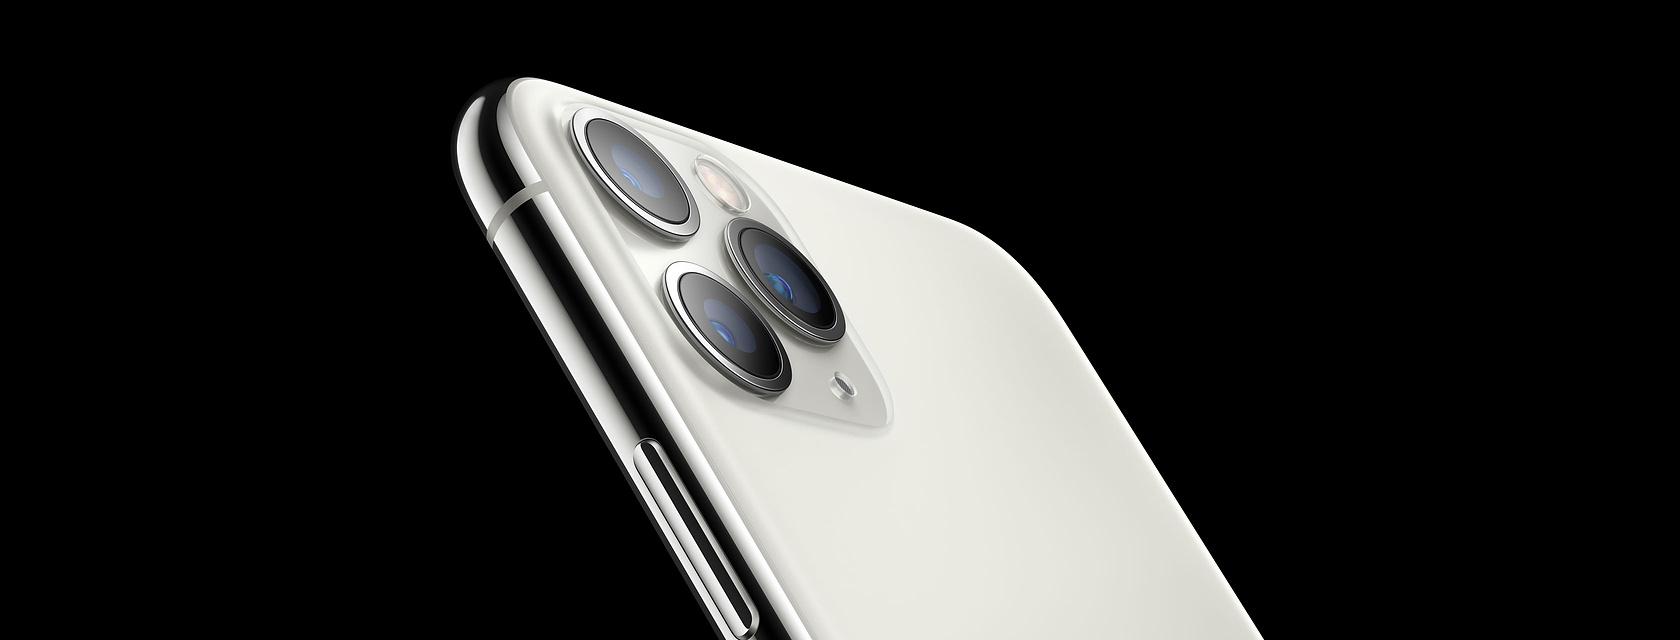 айфон 11 про 64 серебристый